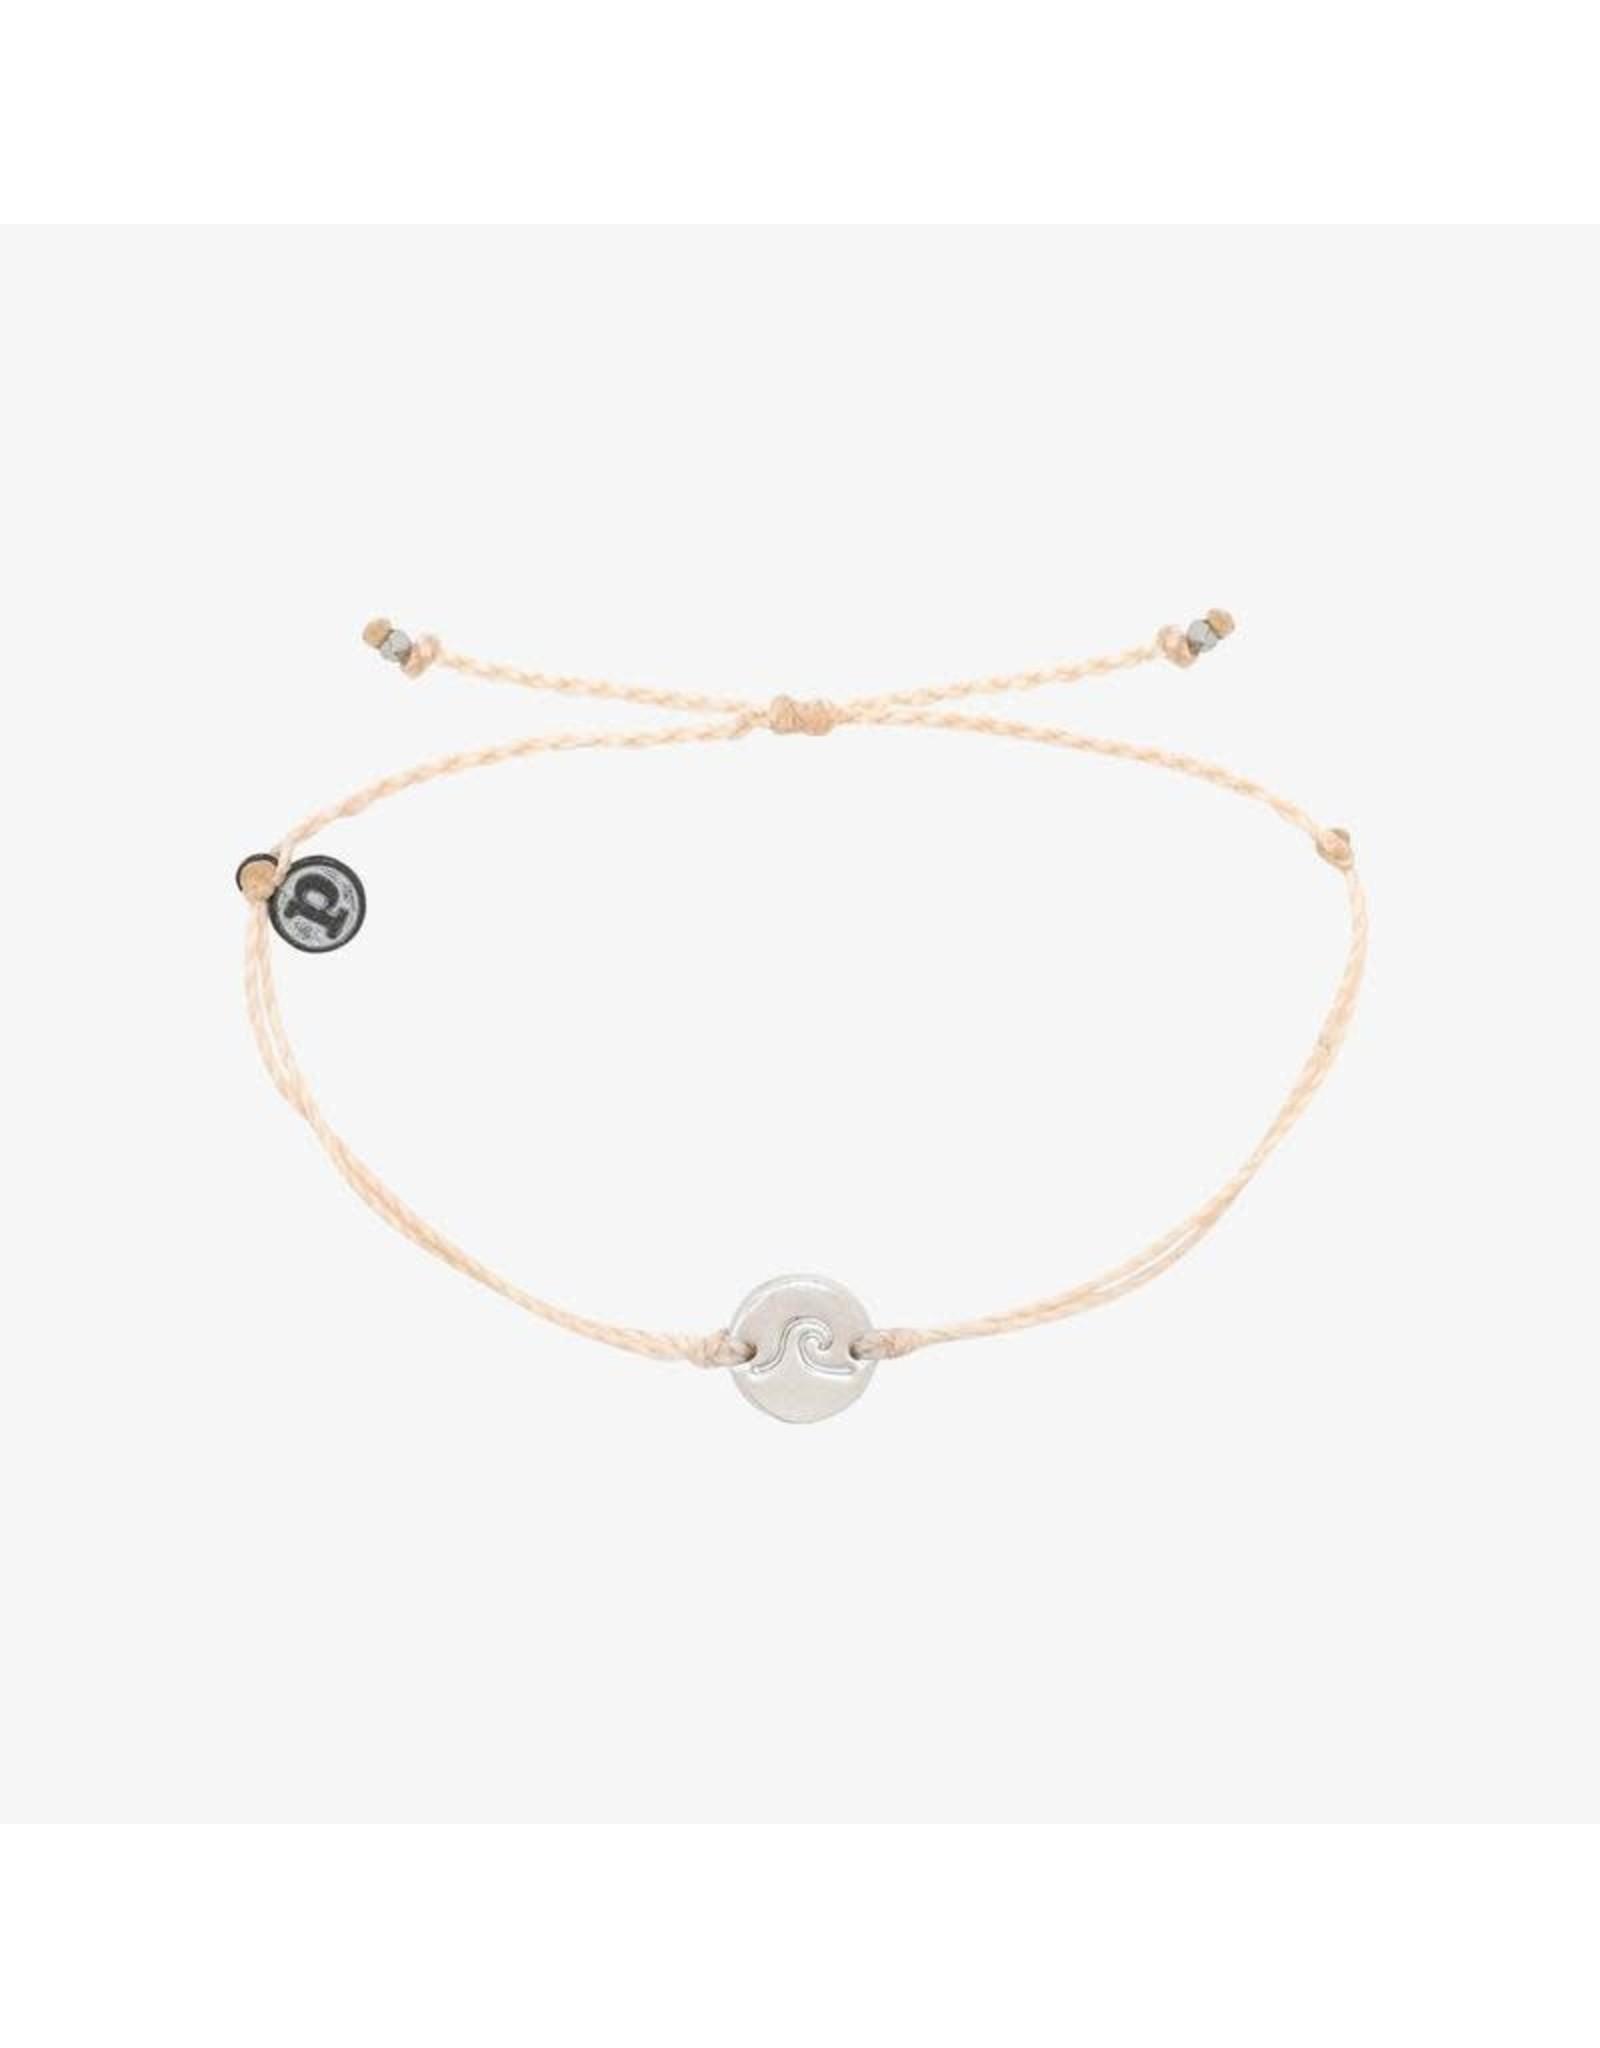 Pura Vida, Silver Wave/Surf Coin Bracelet, Vanilla